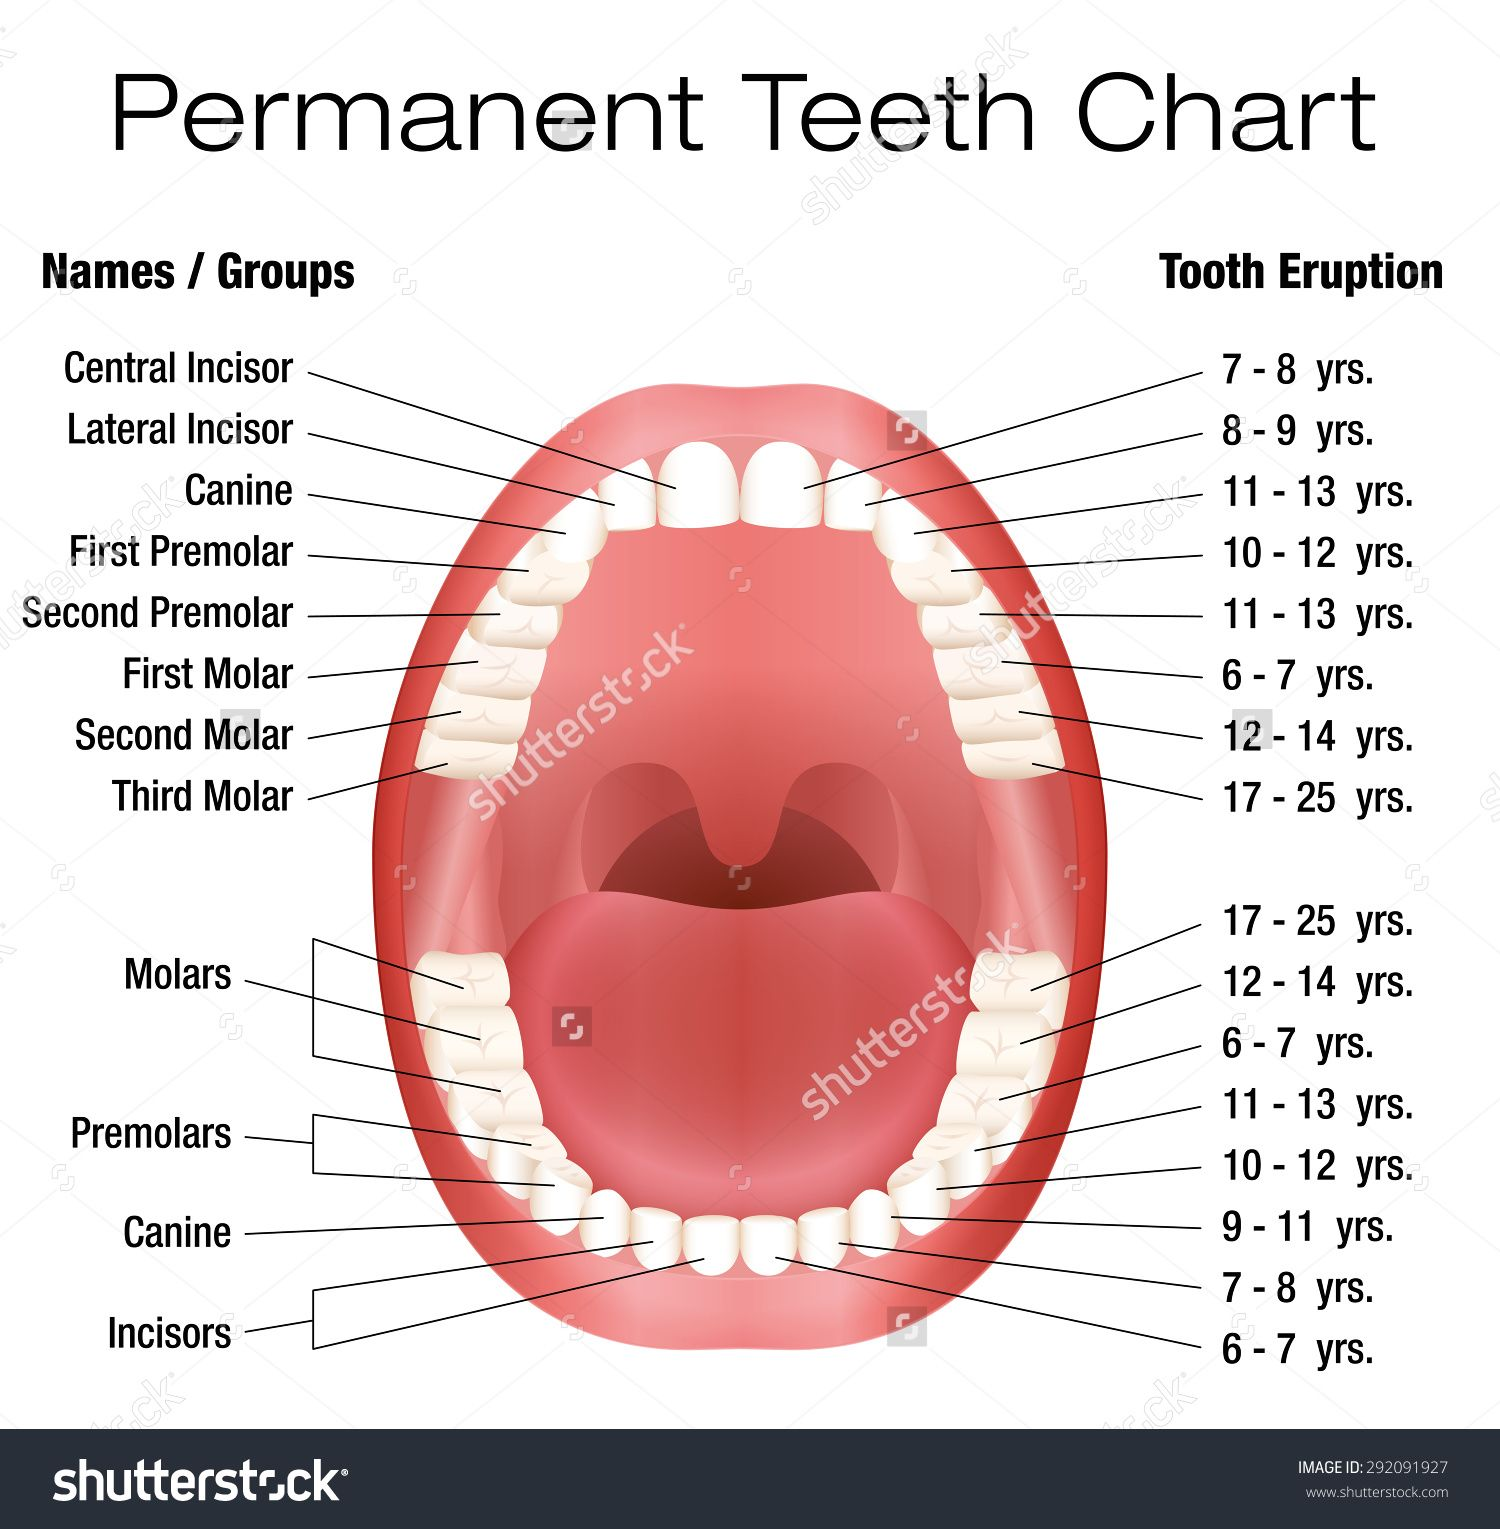 hight resolution of teeth eruption chart teeth images human teeth body organs tooth diagram